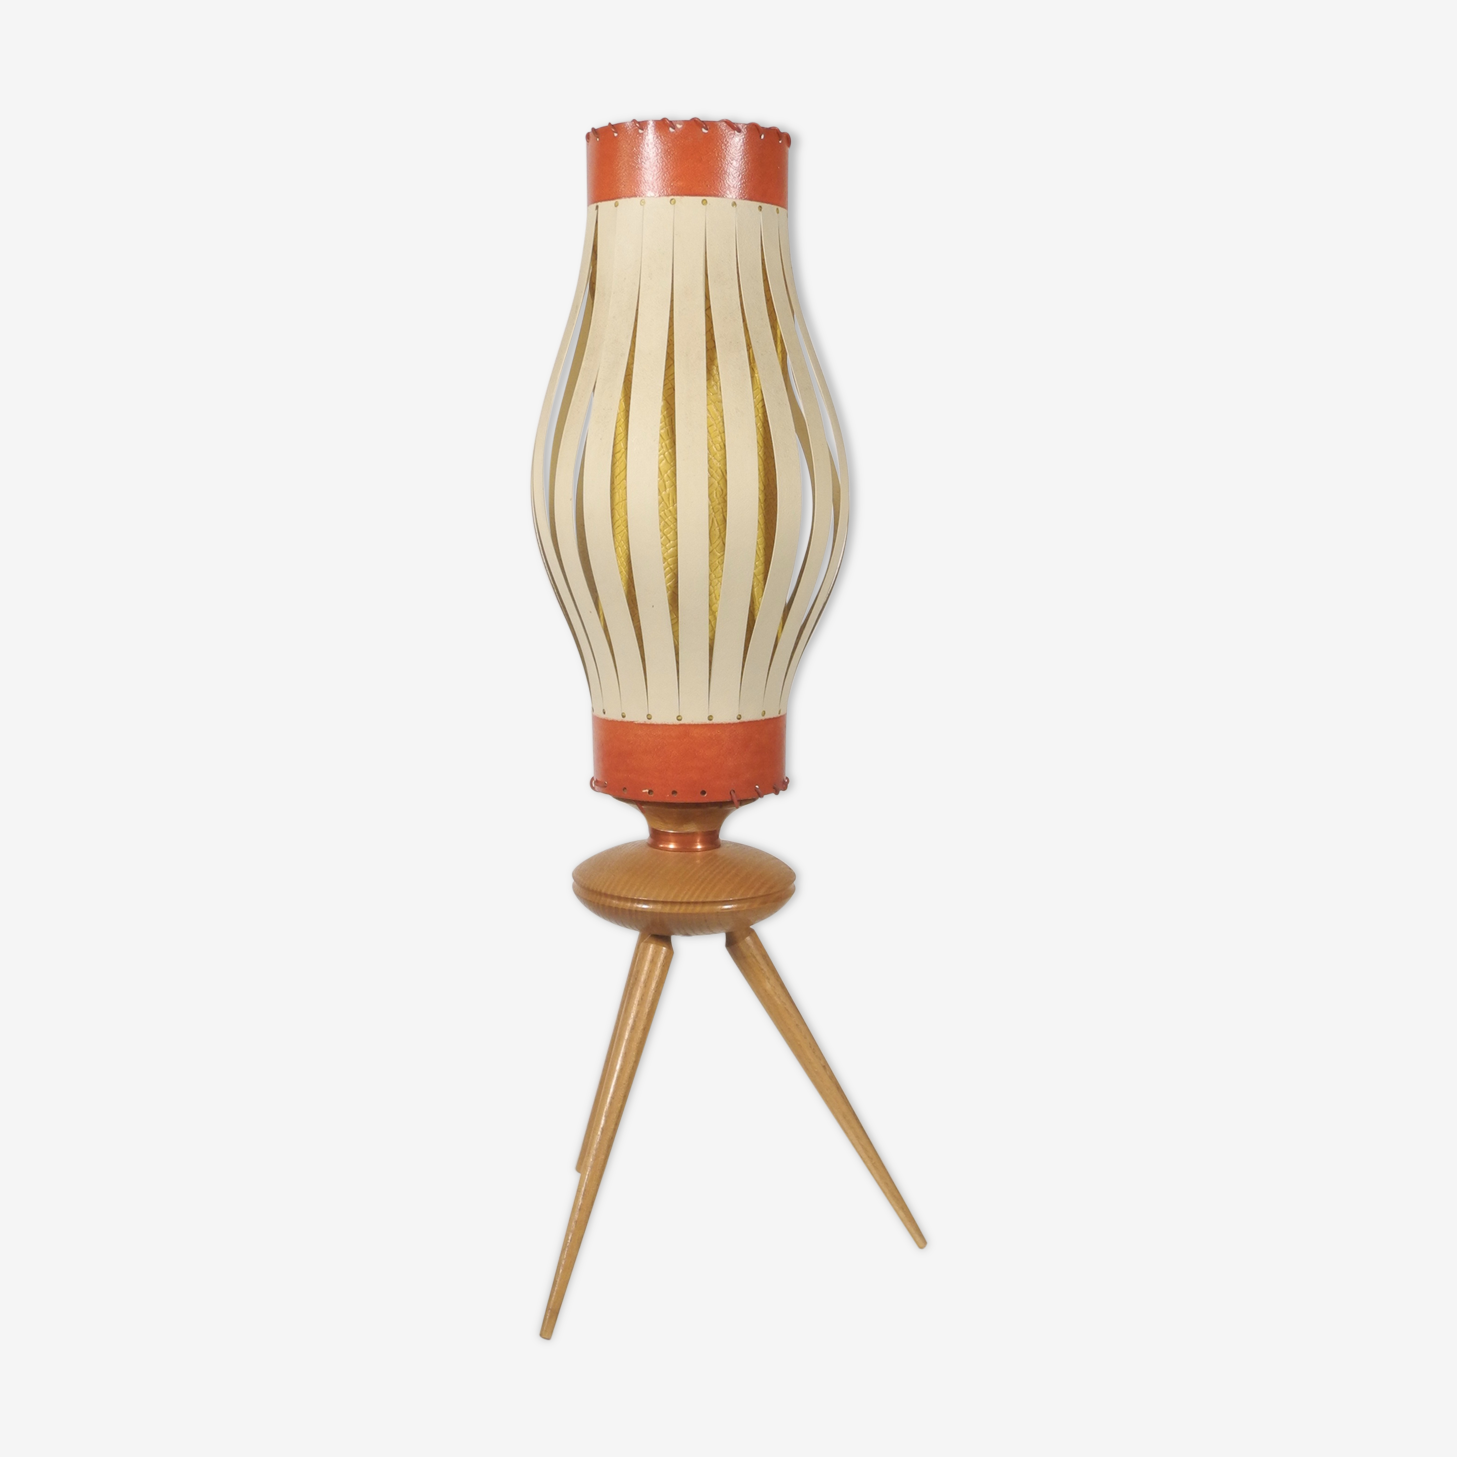 Tripod table lamp, France 1950